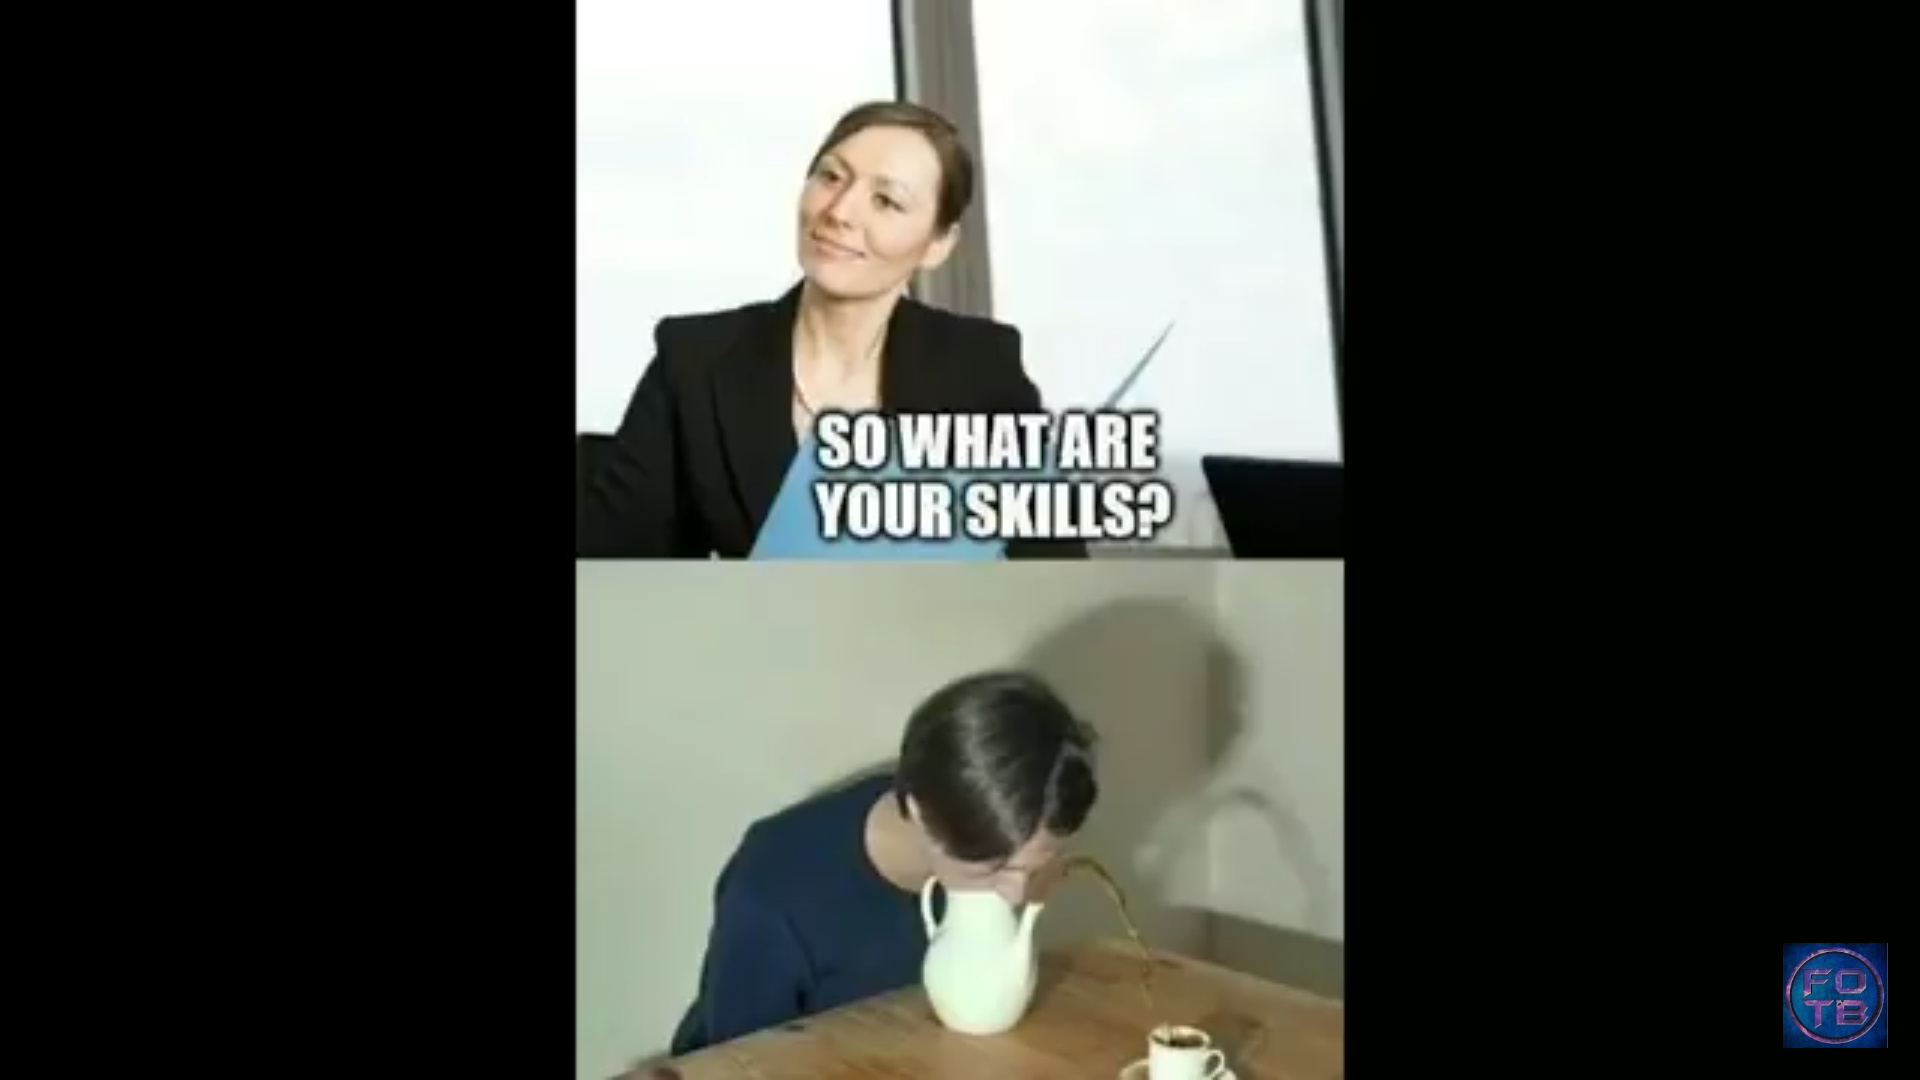 Job interview be liks - meme